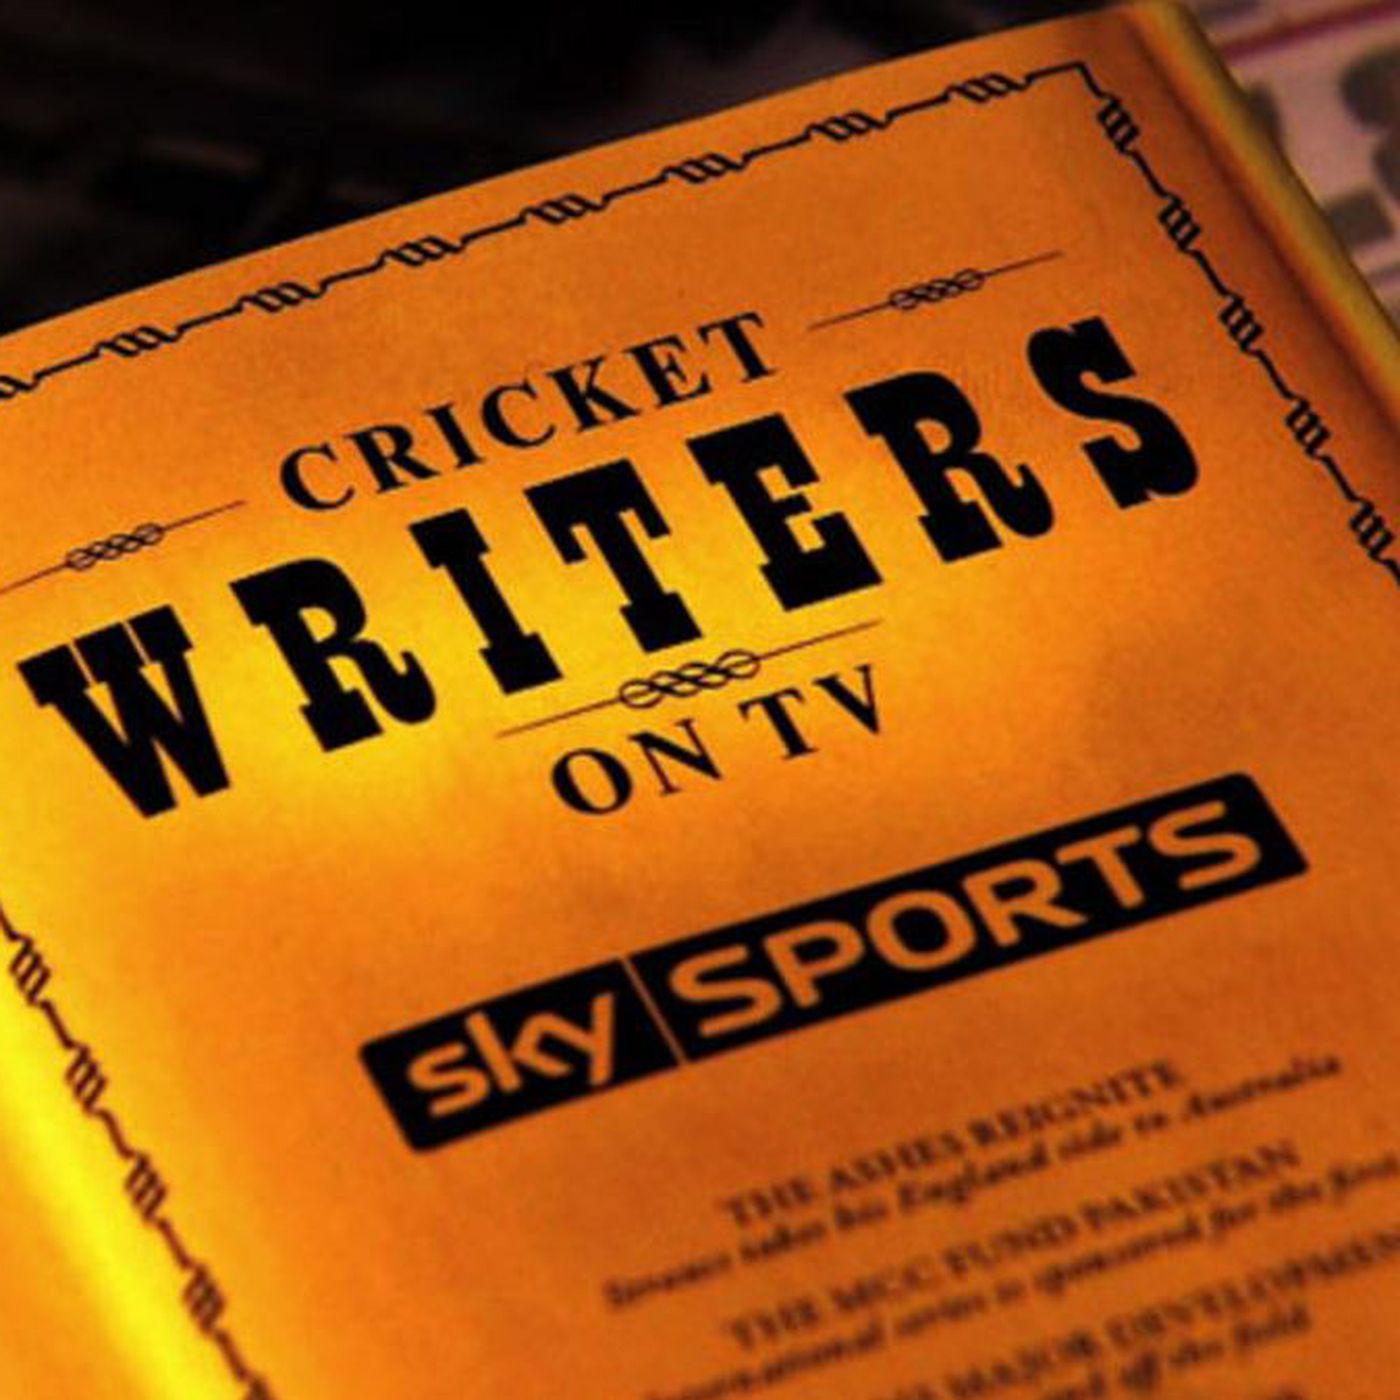 Cricket Writers On TV - July 30